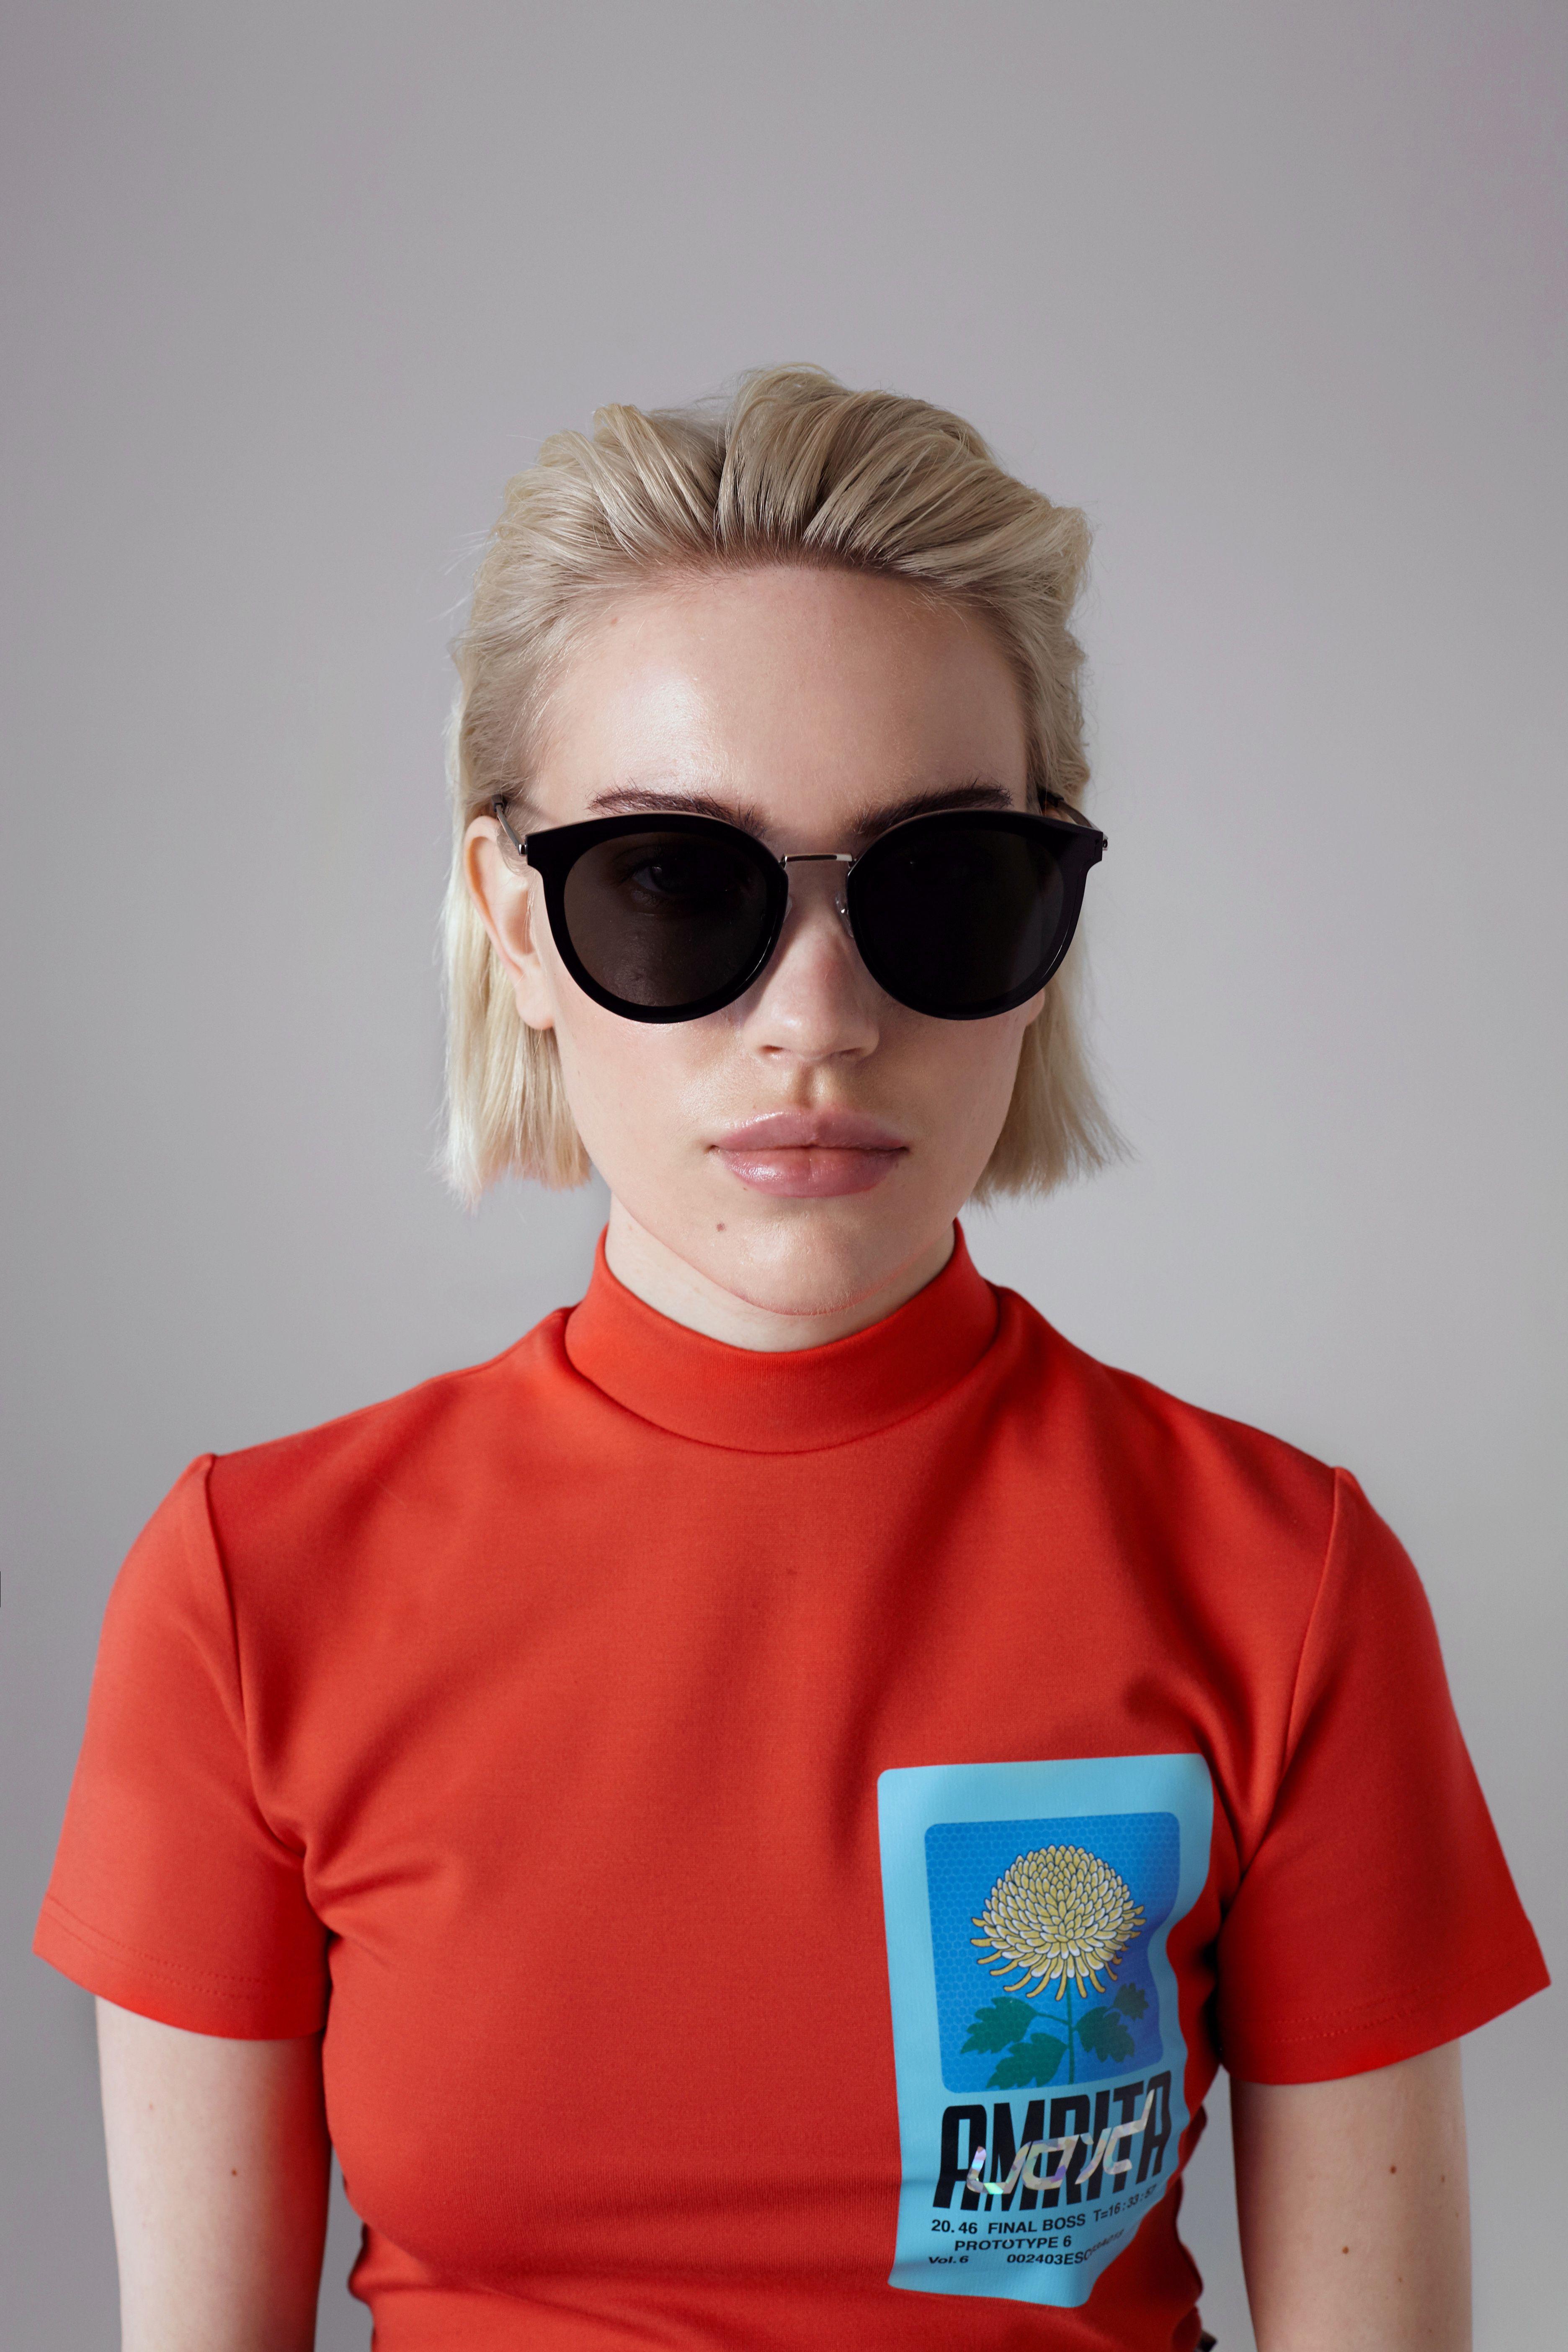 c60b82f31d02 2018 NEW SUNGLASSES LOOKBOOK Merlynn 01  gentlemonster  sunglasses   lookbook  redwideopen  fashion  merlynn